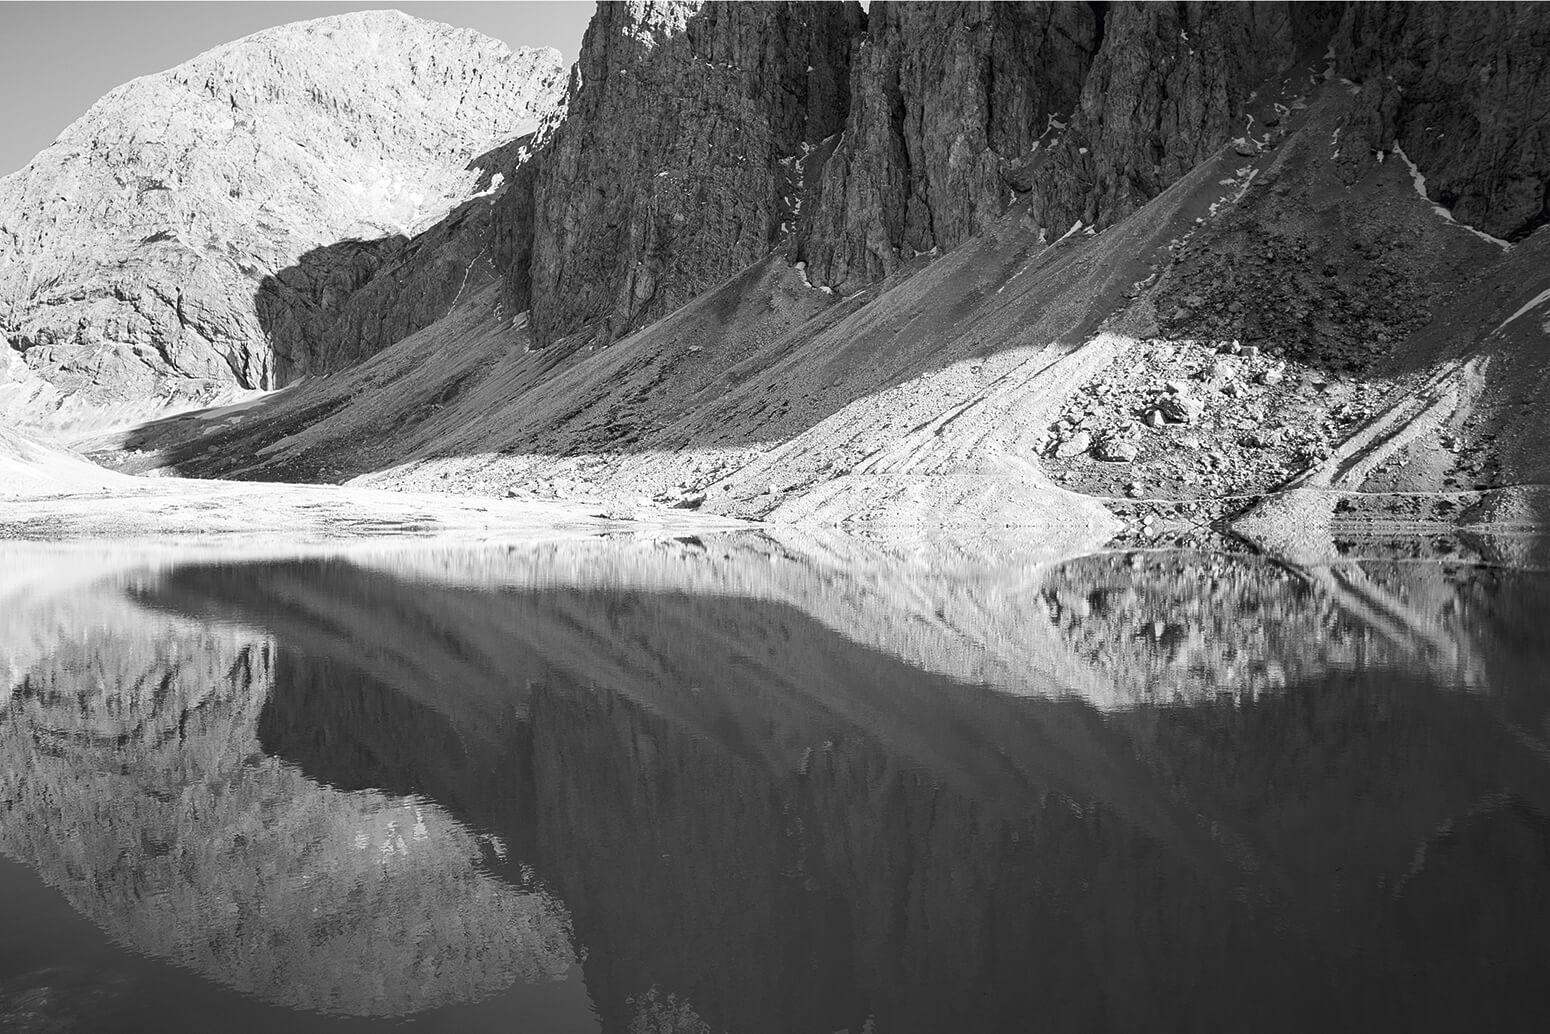 7 Fotodiagnostik Davide Baldrati